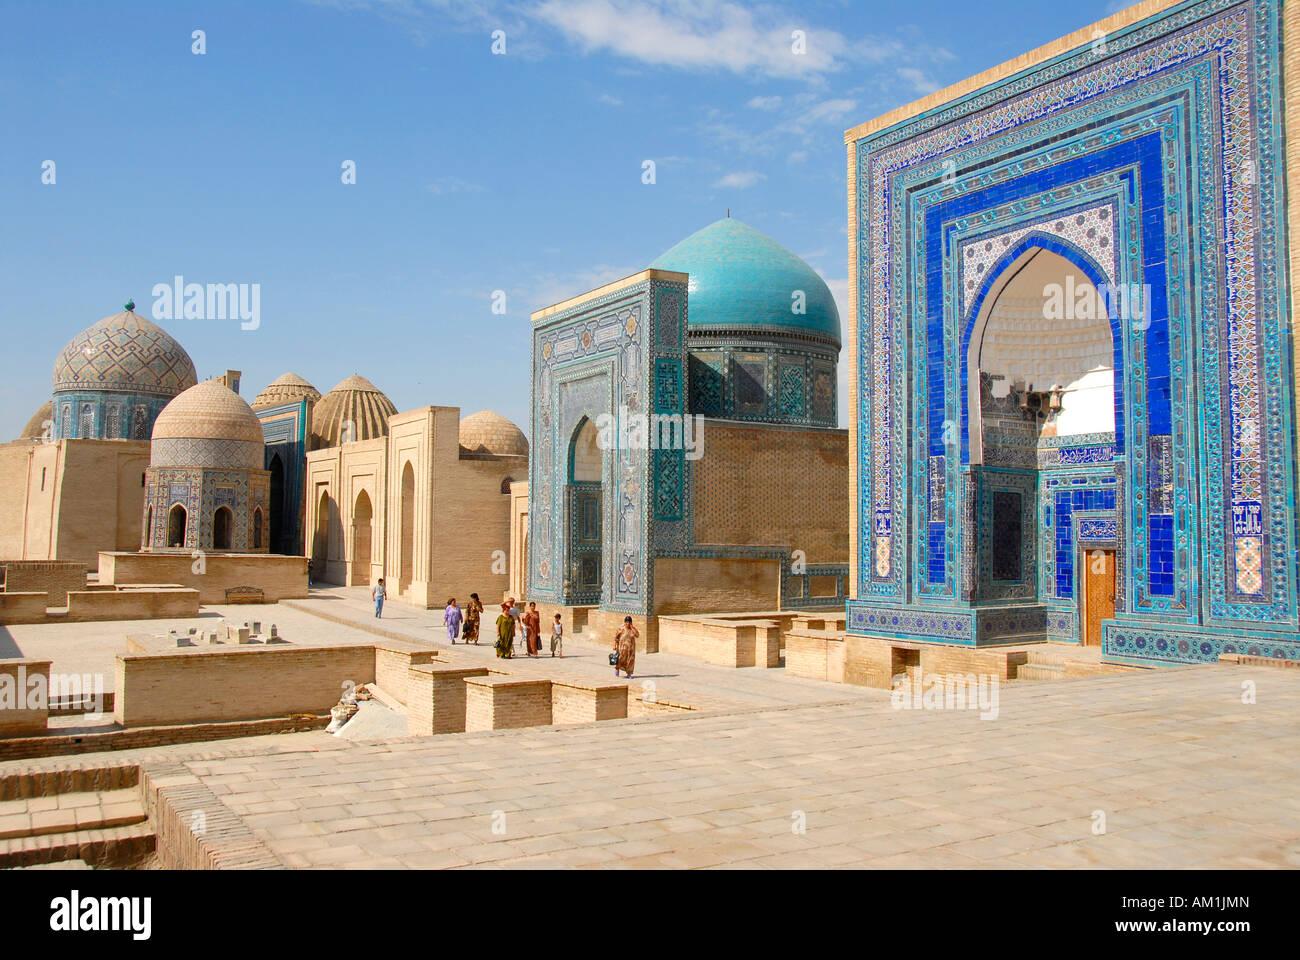 Mausoleums with blue decorated iwans and cupolas Necropolis Shah-i-Zinda Samarkand Uzbekistan Stock Photo